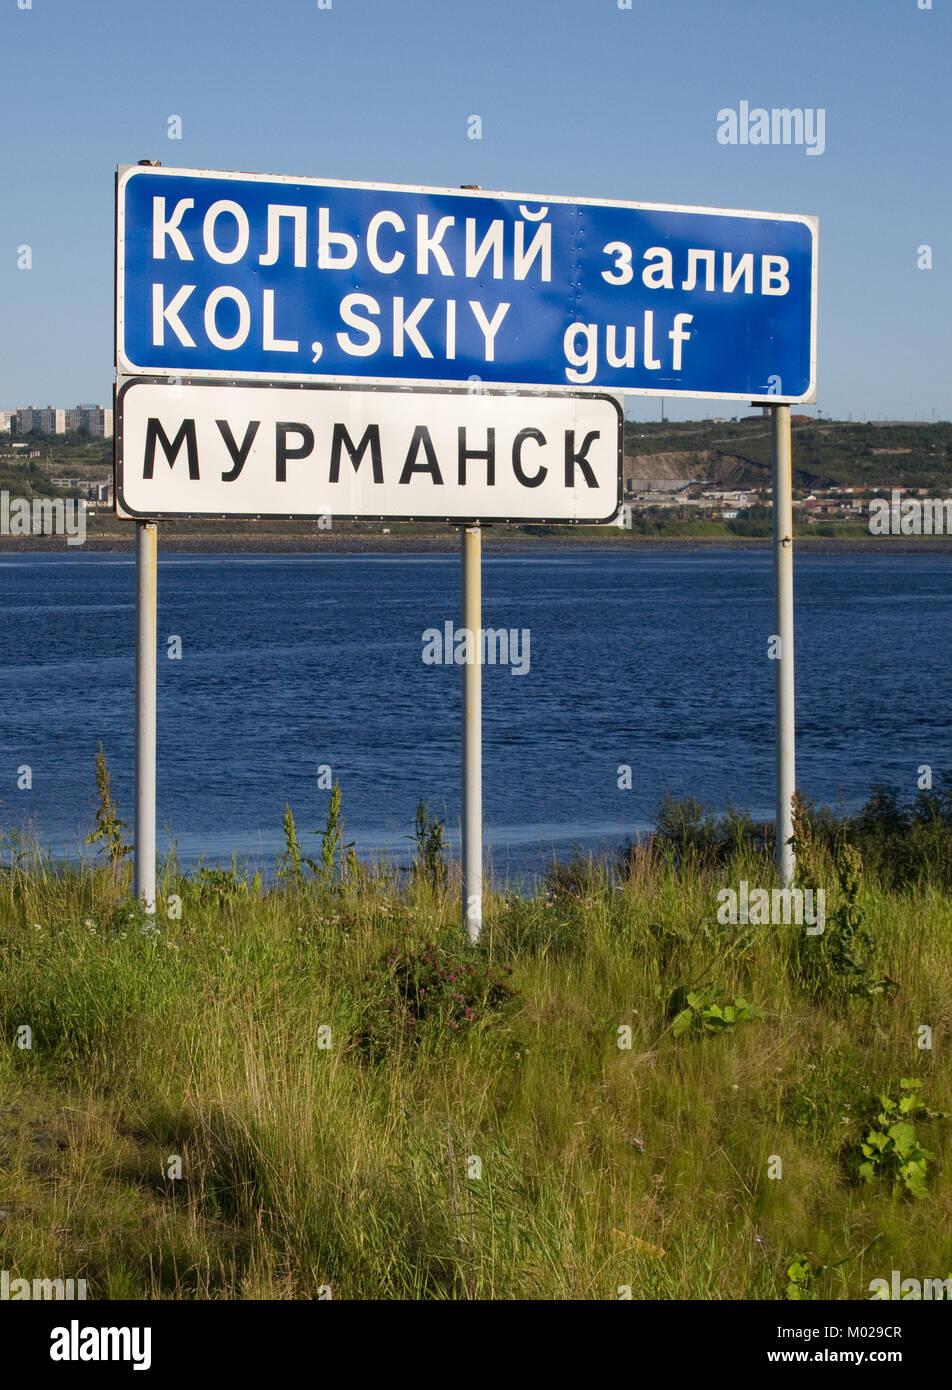 Pointer Kola bay and city Murmansk - Stock Image